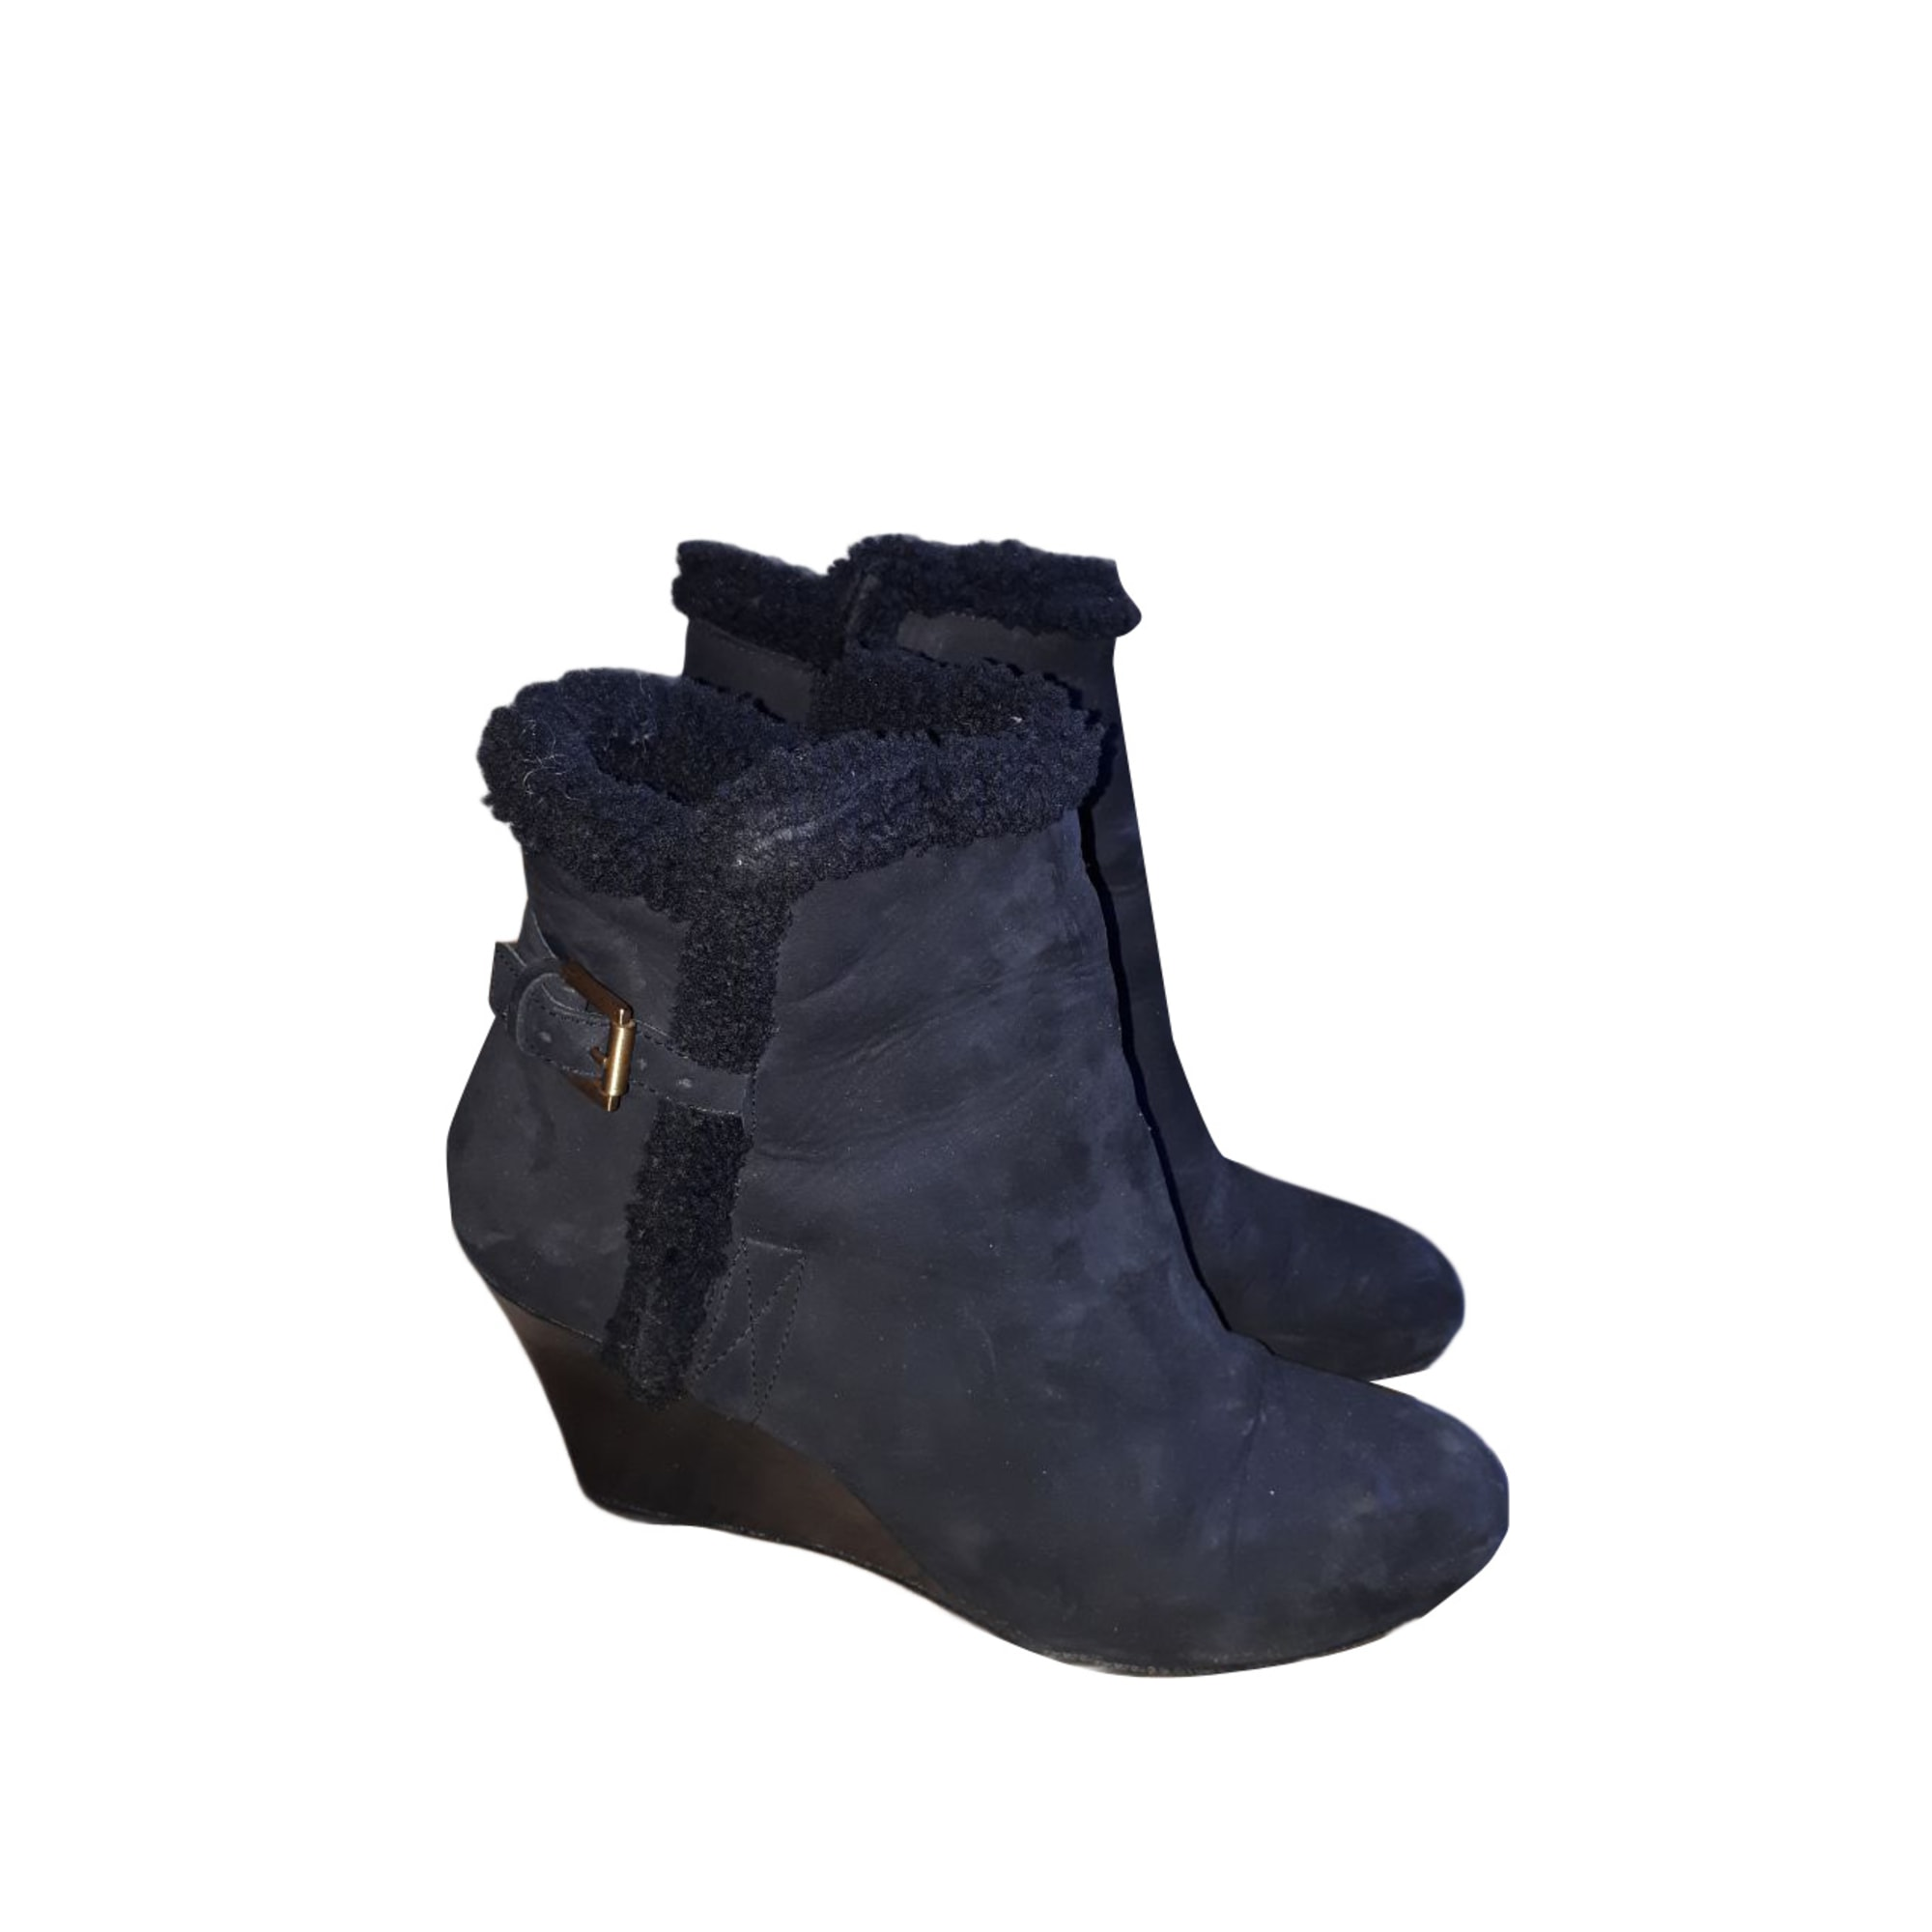 Wedge Ankle Boots GERARD DAREL Black